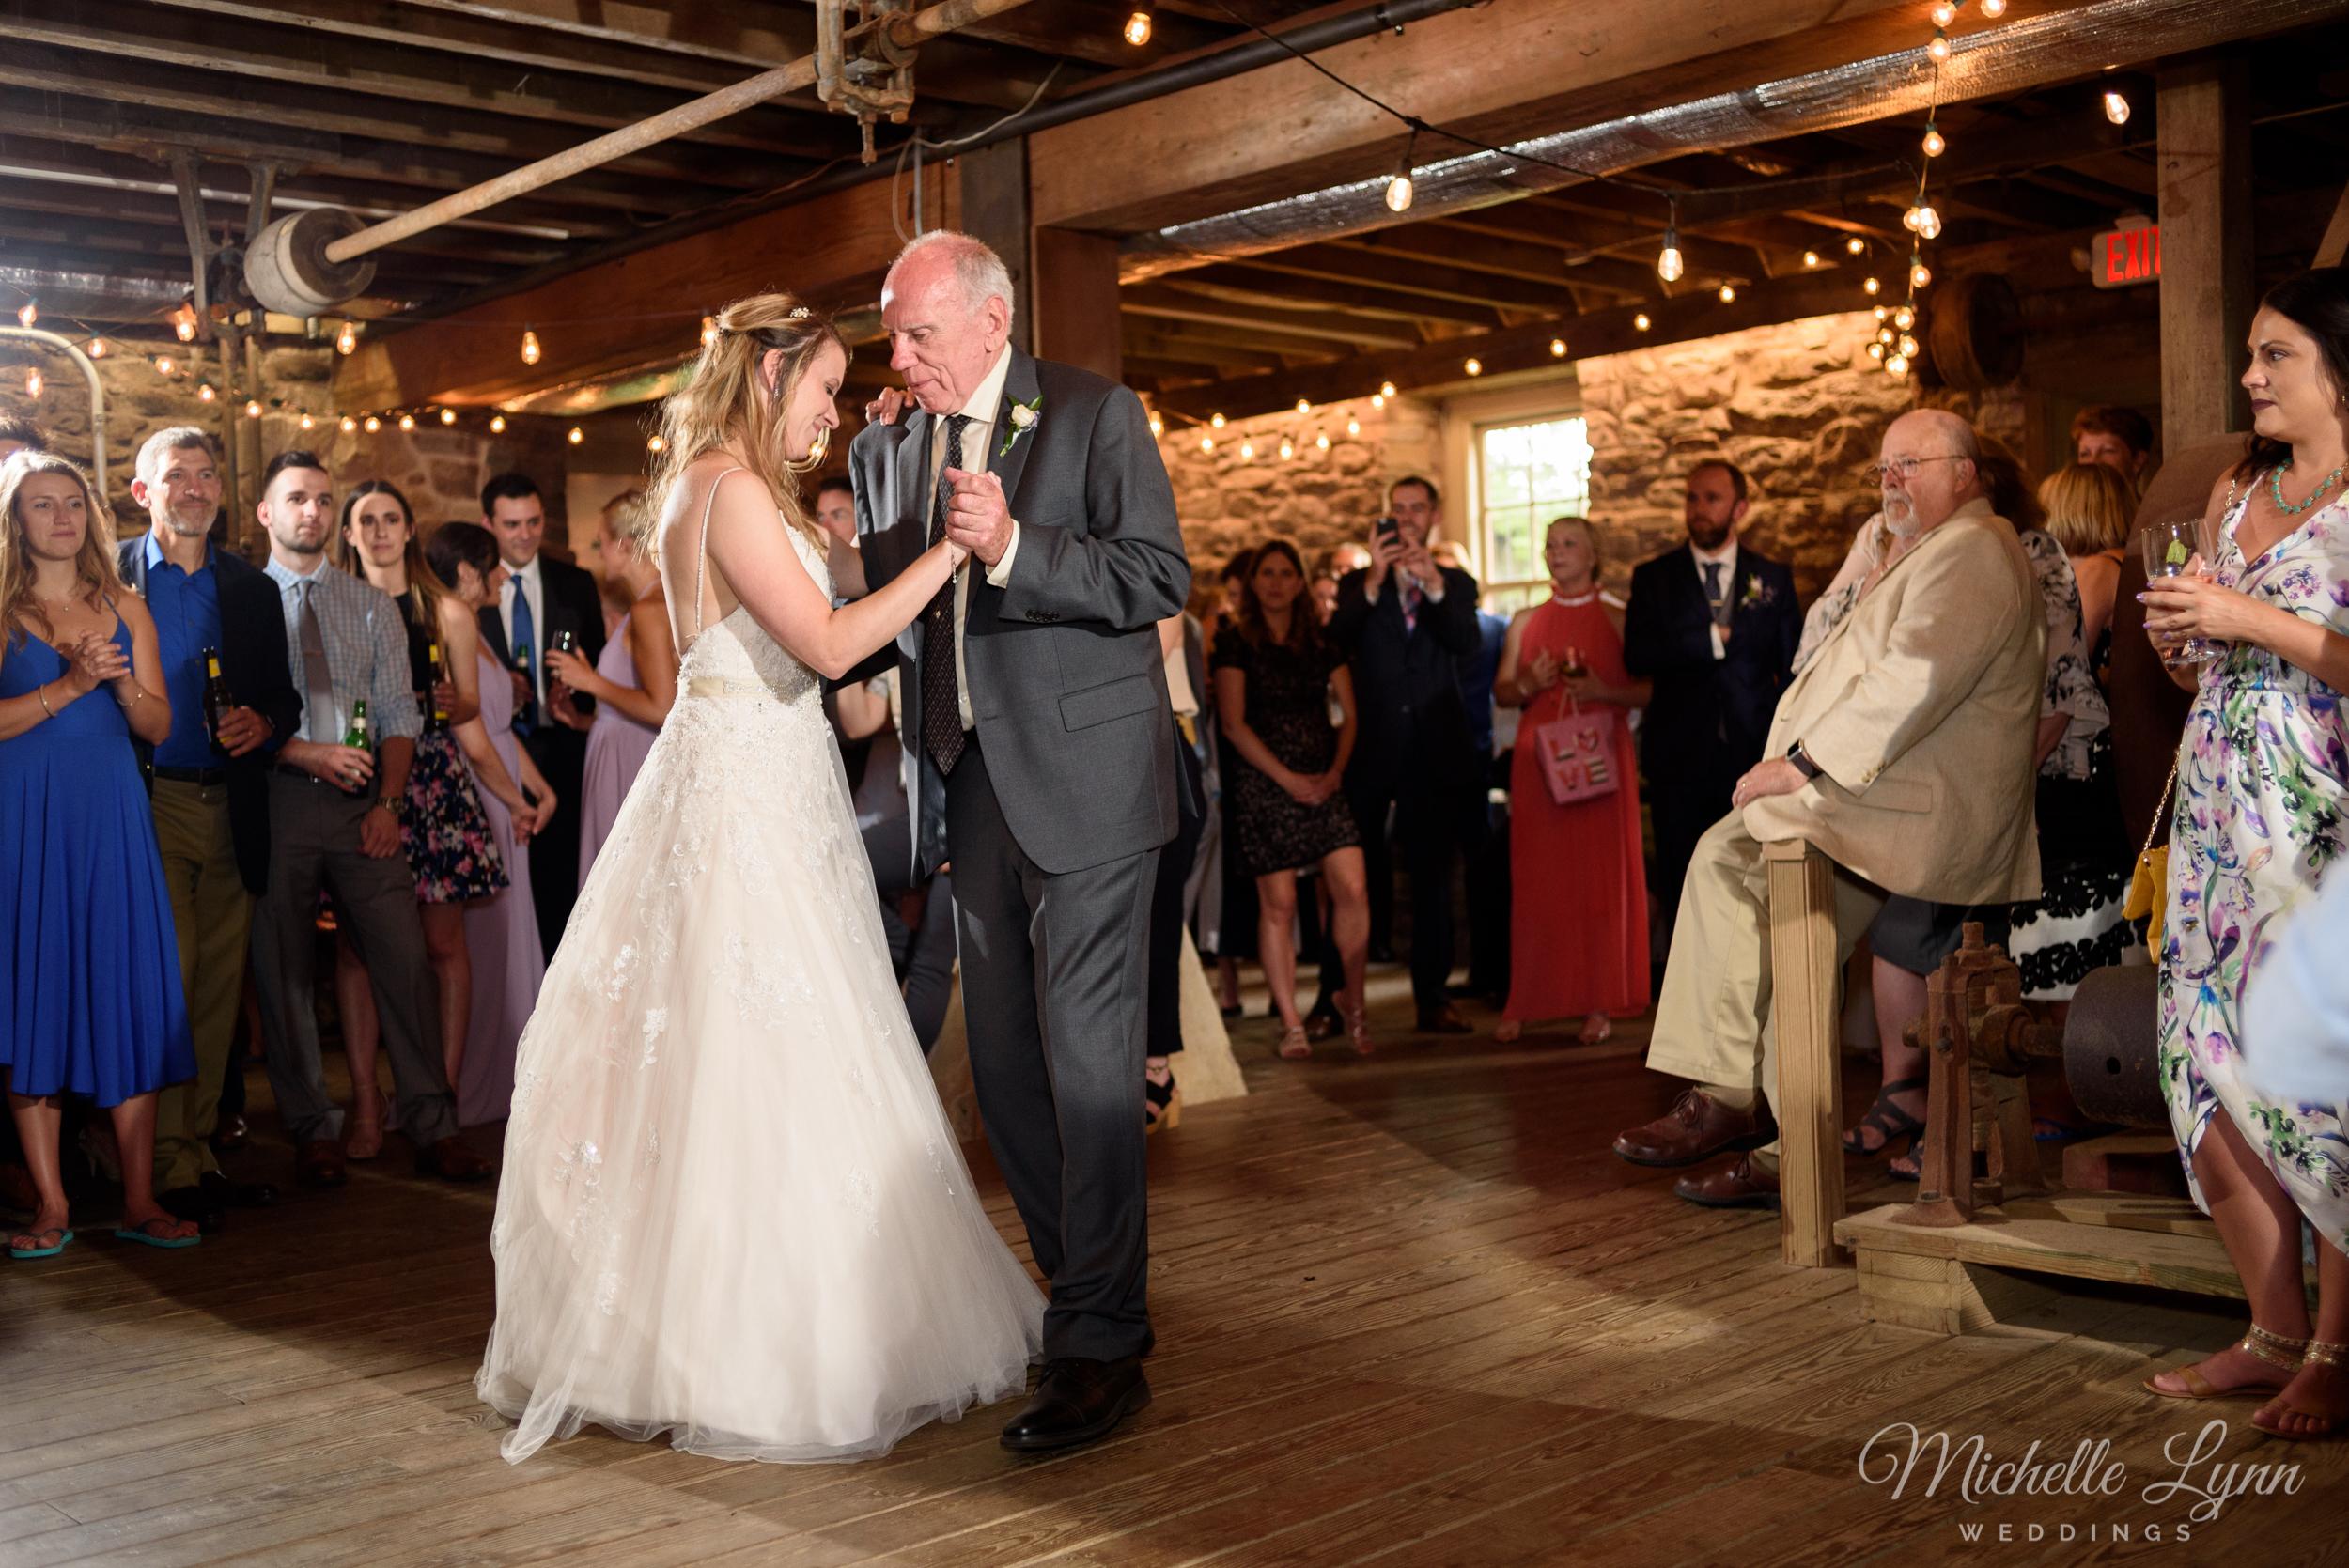 mlw-prallsville-mills-nj-wedding-photographer-82.jpg